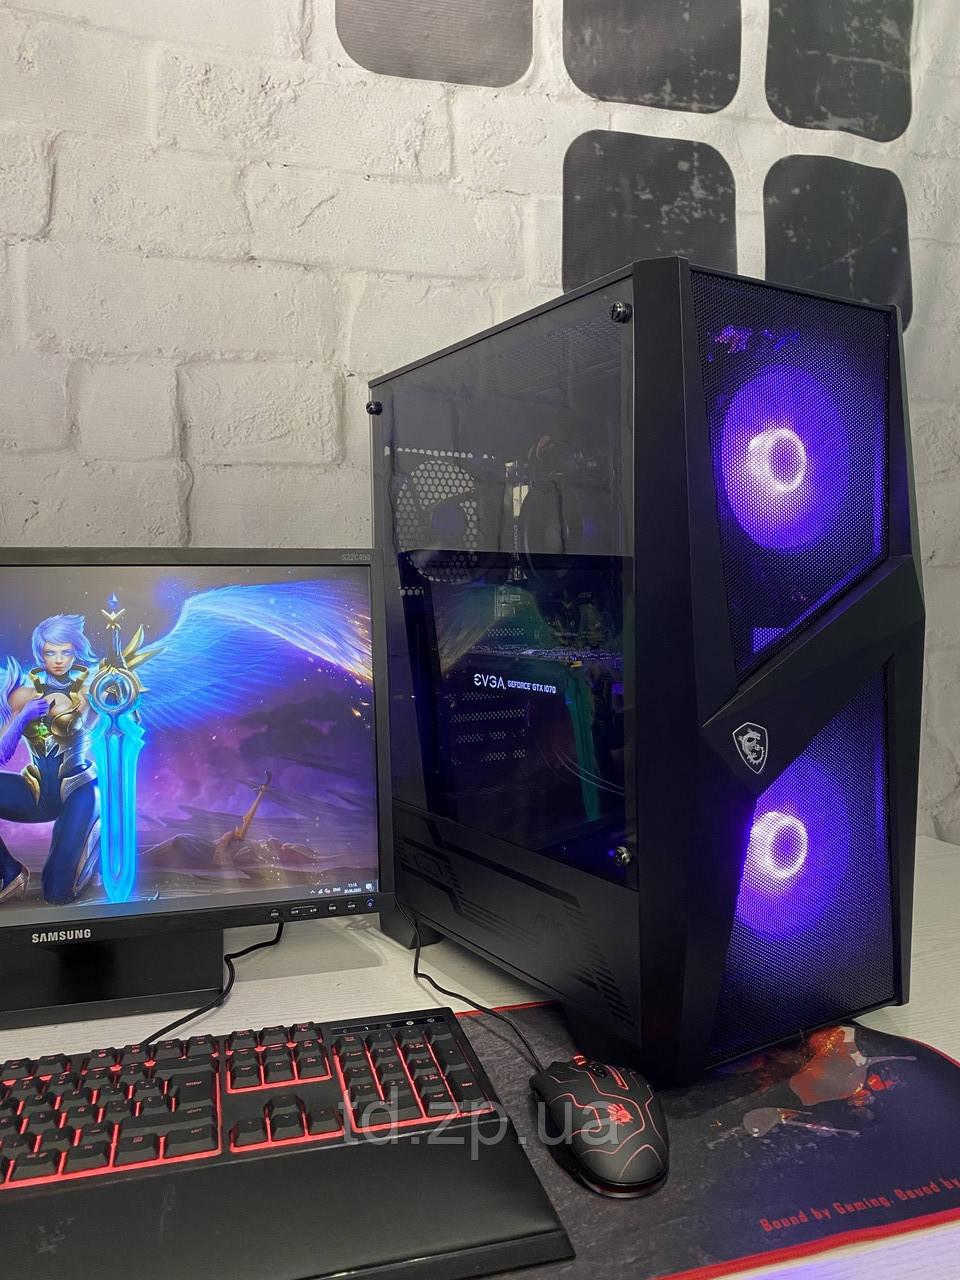 Игровой компьютер Ryzen 3 3100 + GTX 1070 8Gb + RAM 16GB + HDD 2000Gb + SSD M.2 240Gb